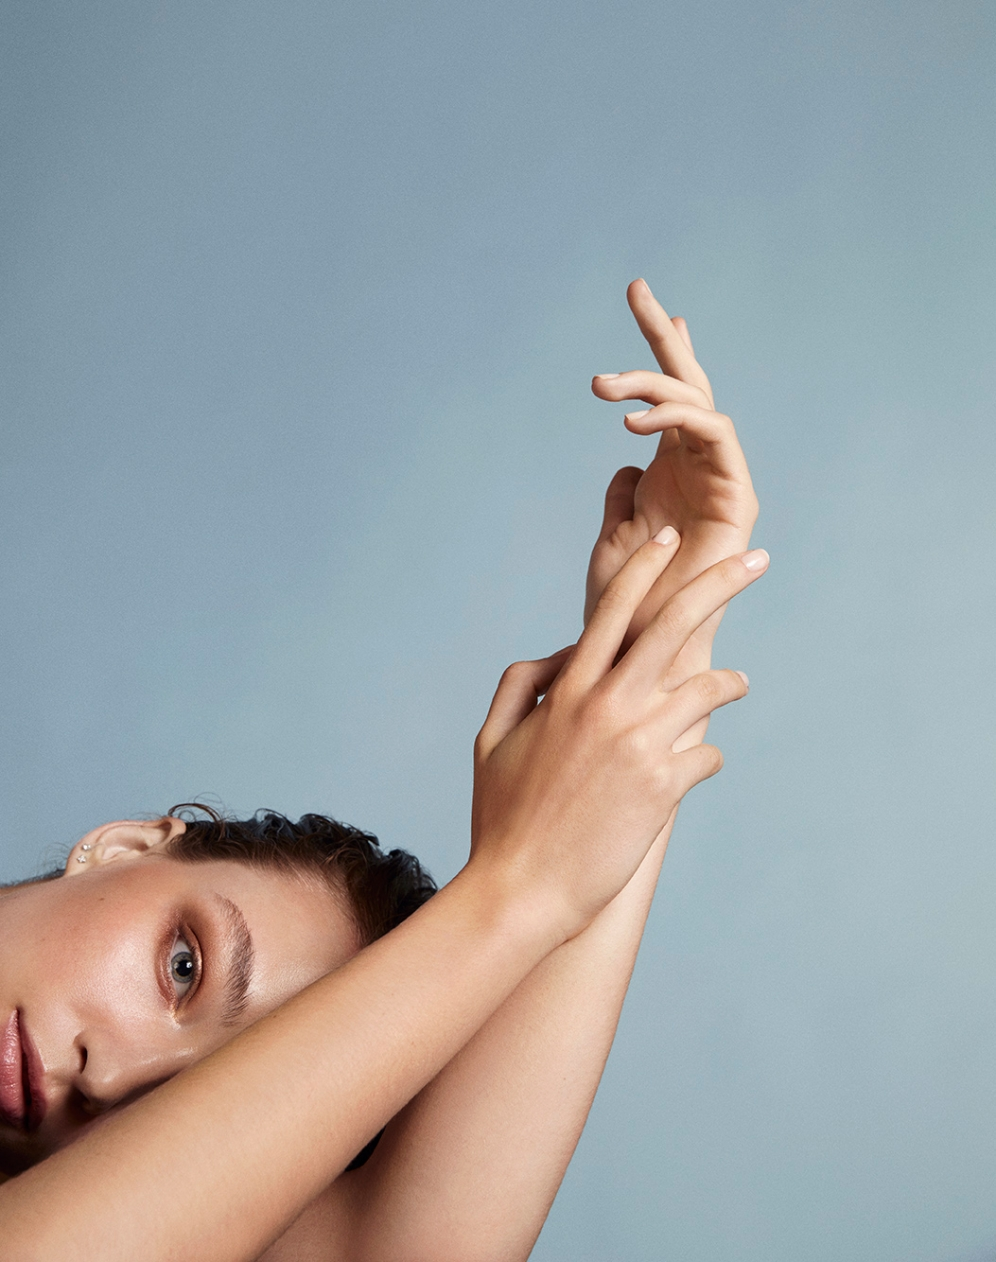 STELLA MAGAZINE | CAN'T STEAL MY SUNSHINE